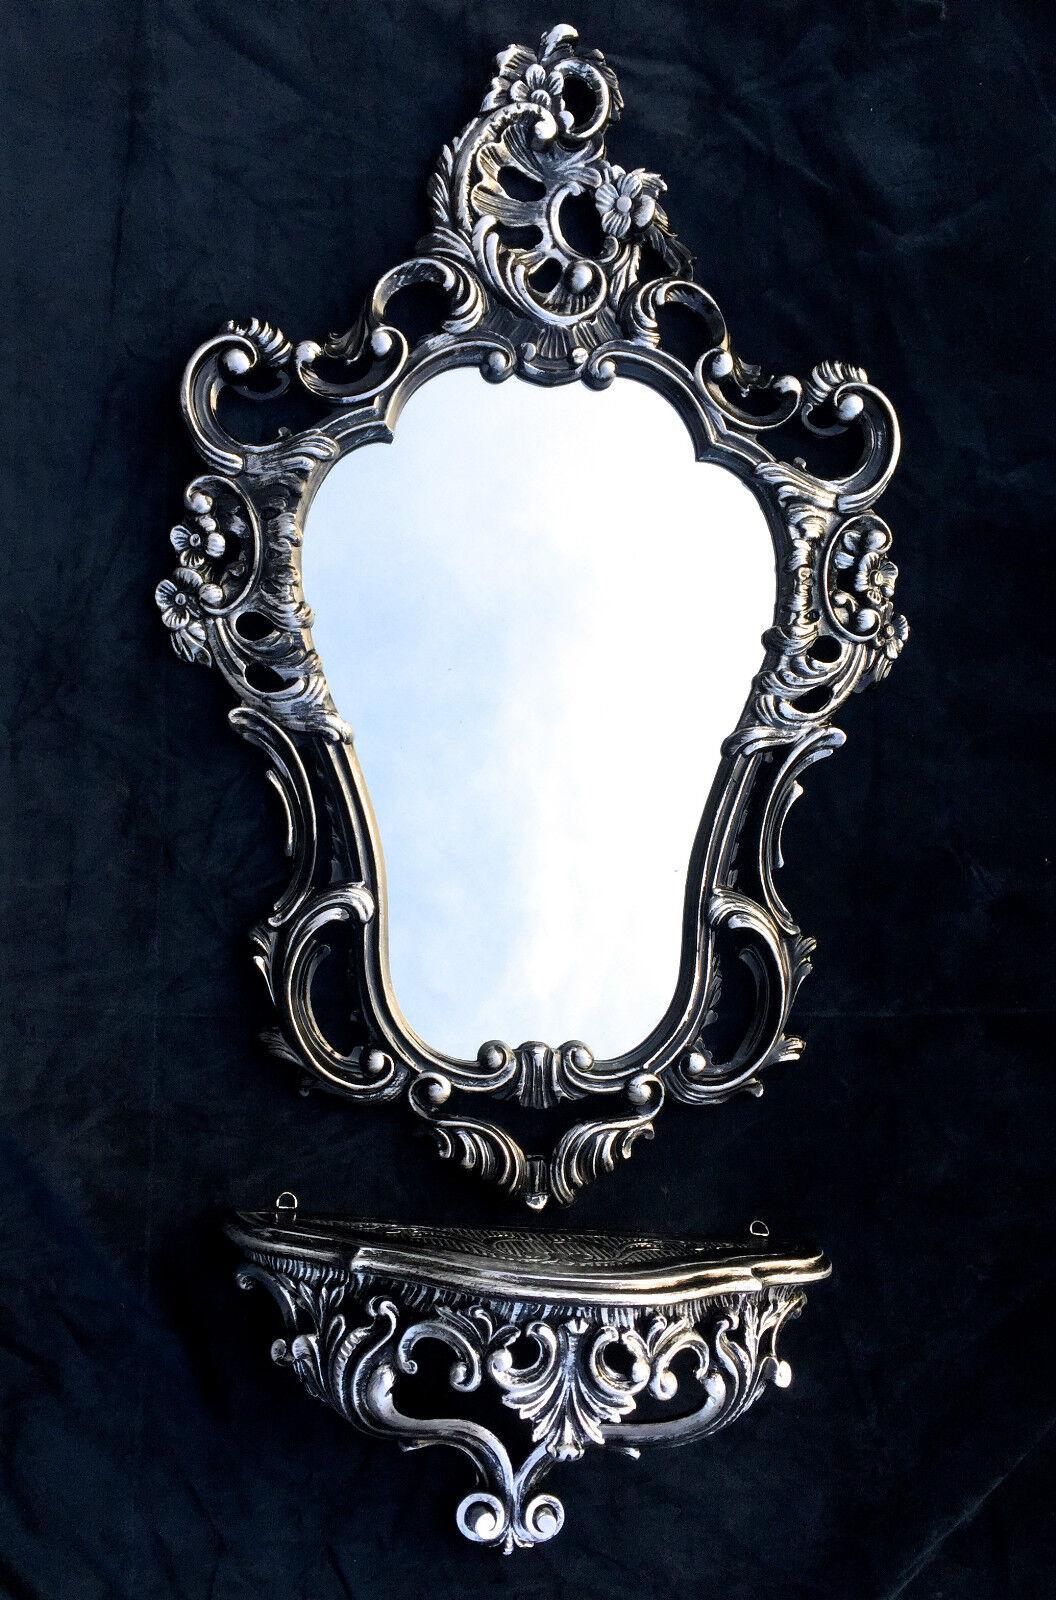 Miroir Mural Noir Argent Baroque Avec Support Mural Antique 50X76 plateau NEUF